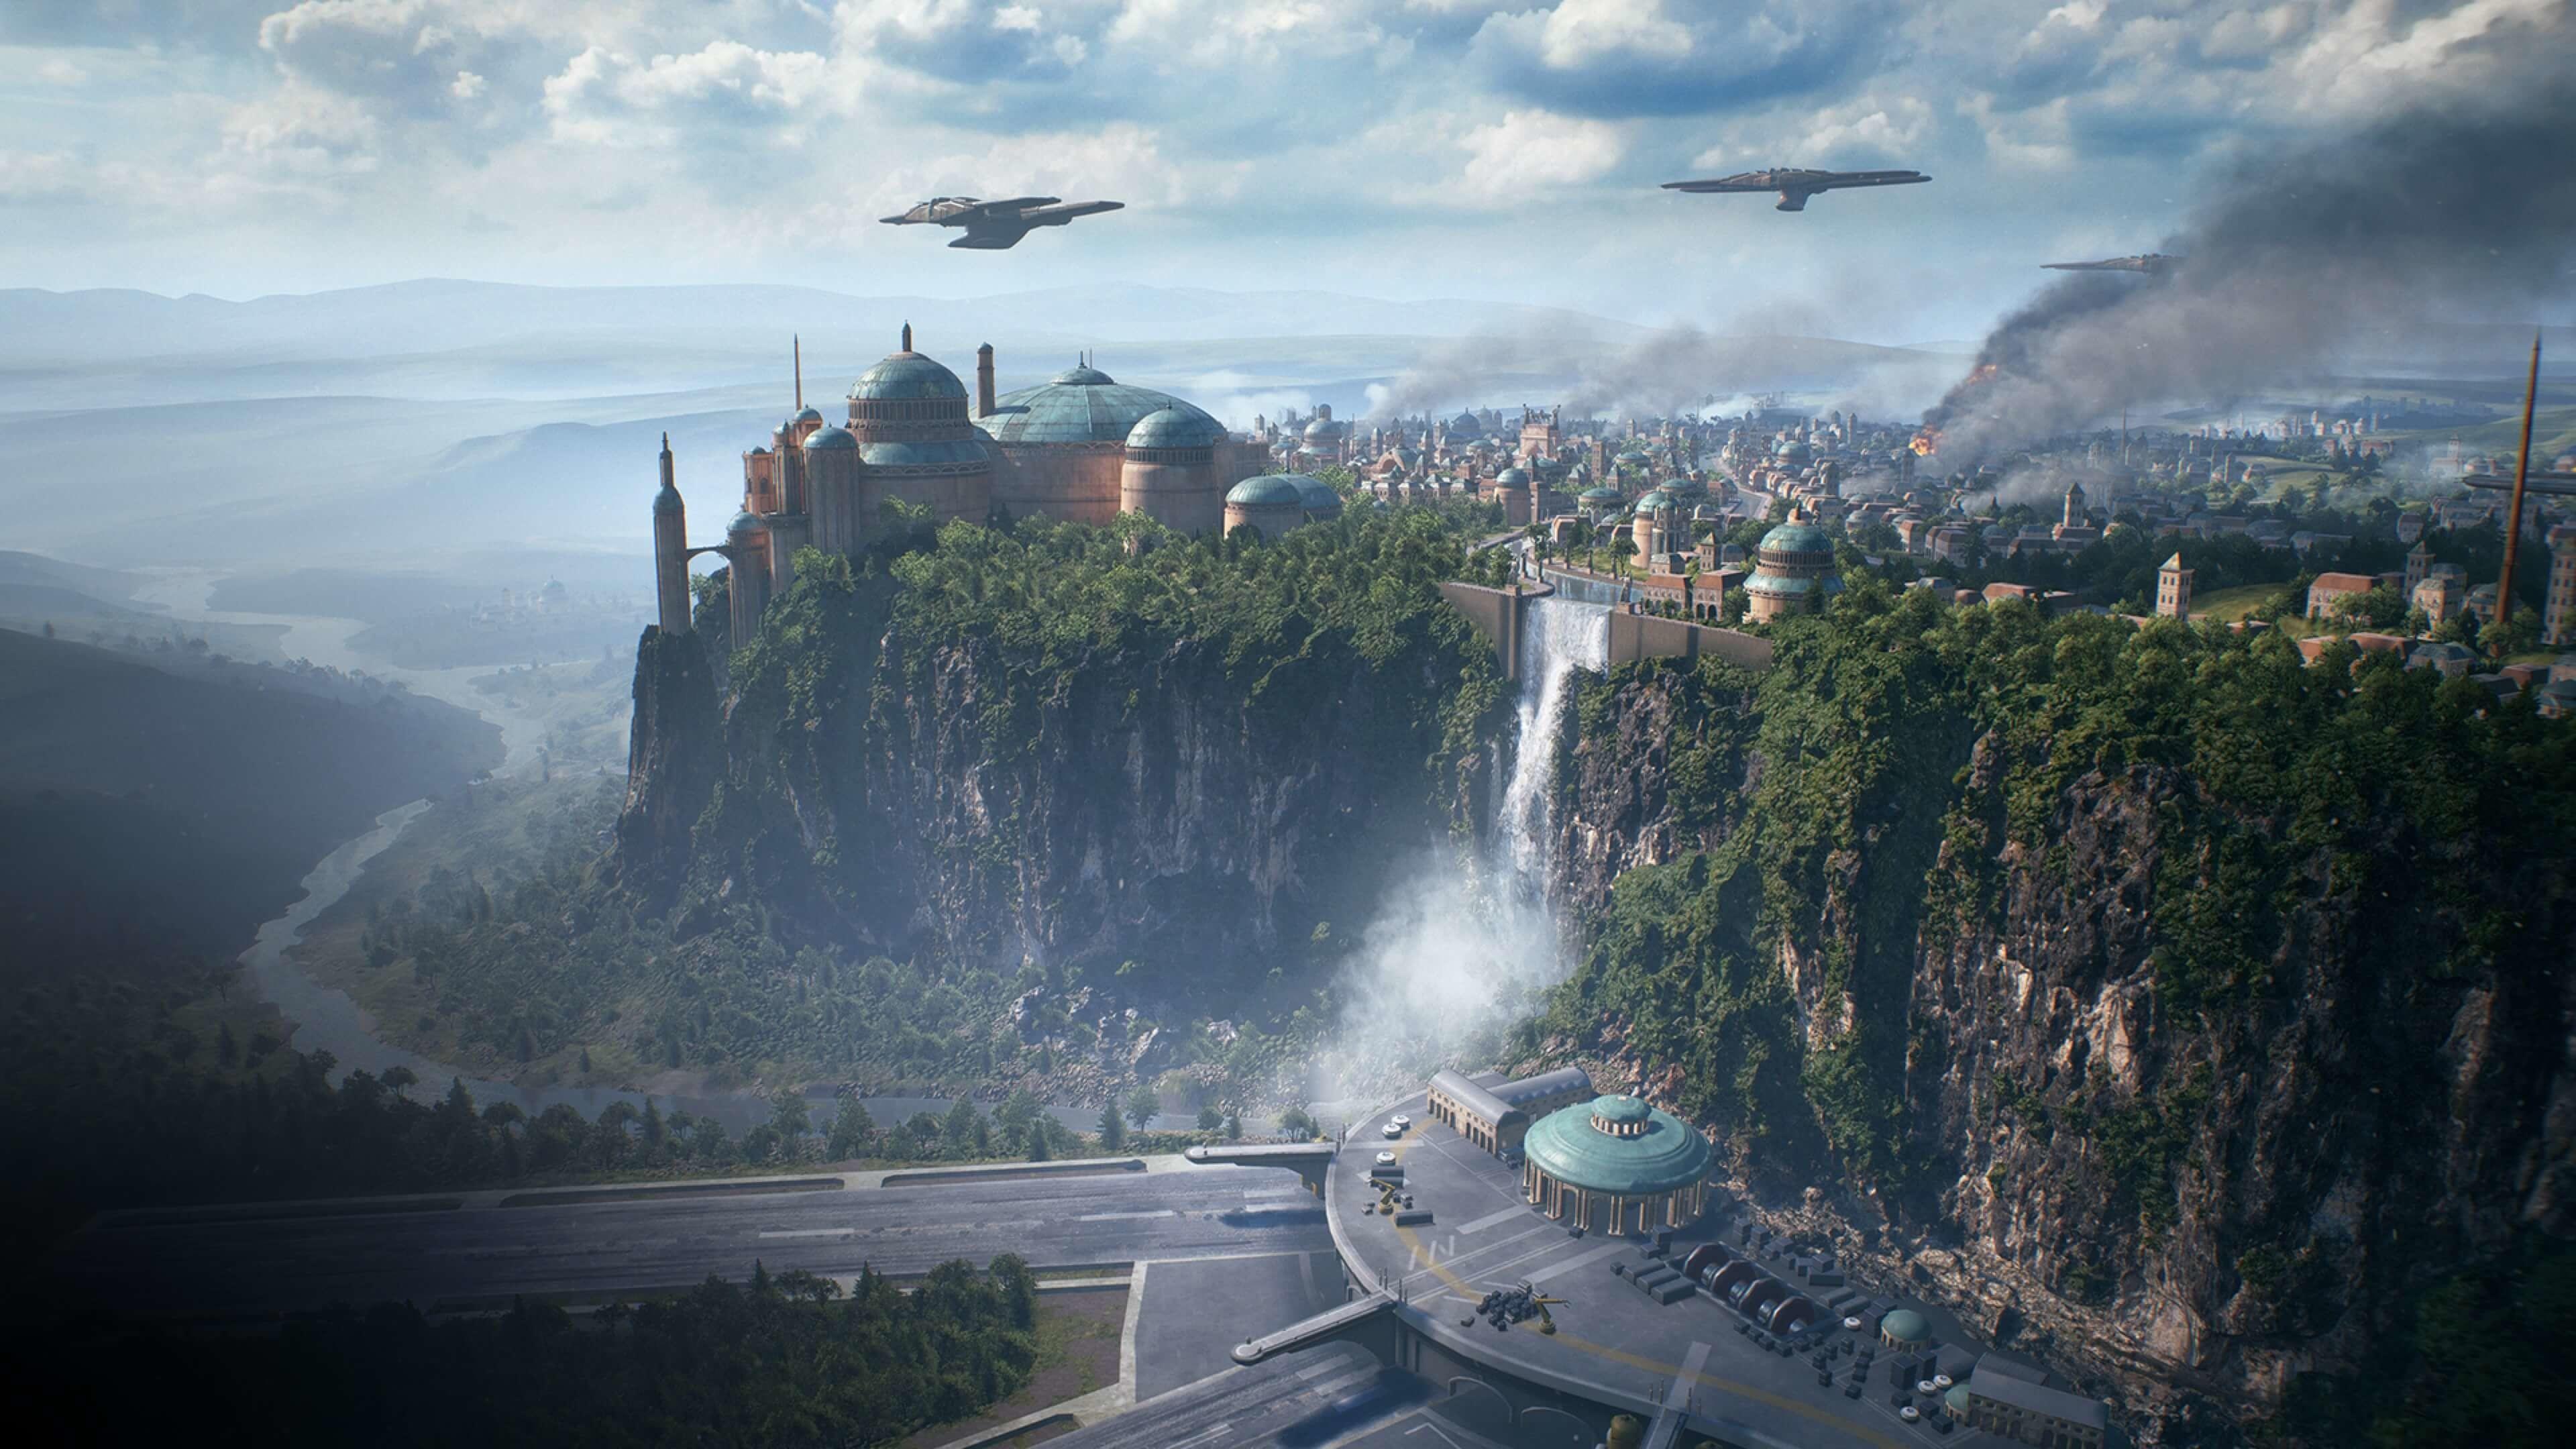 Star Wars Battlefront 2015 Wallpaper – WallpaperSafari